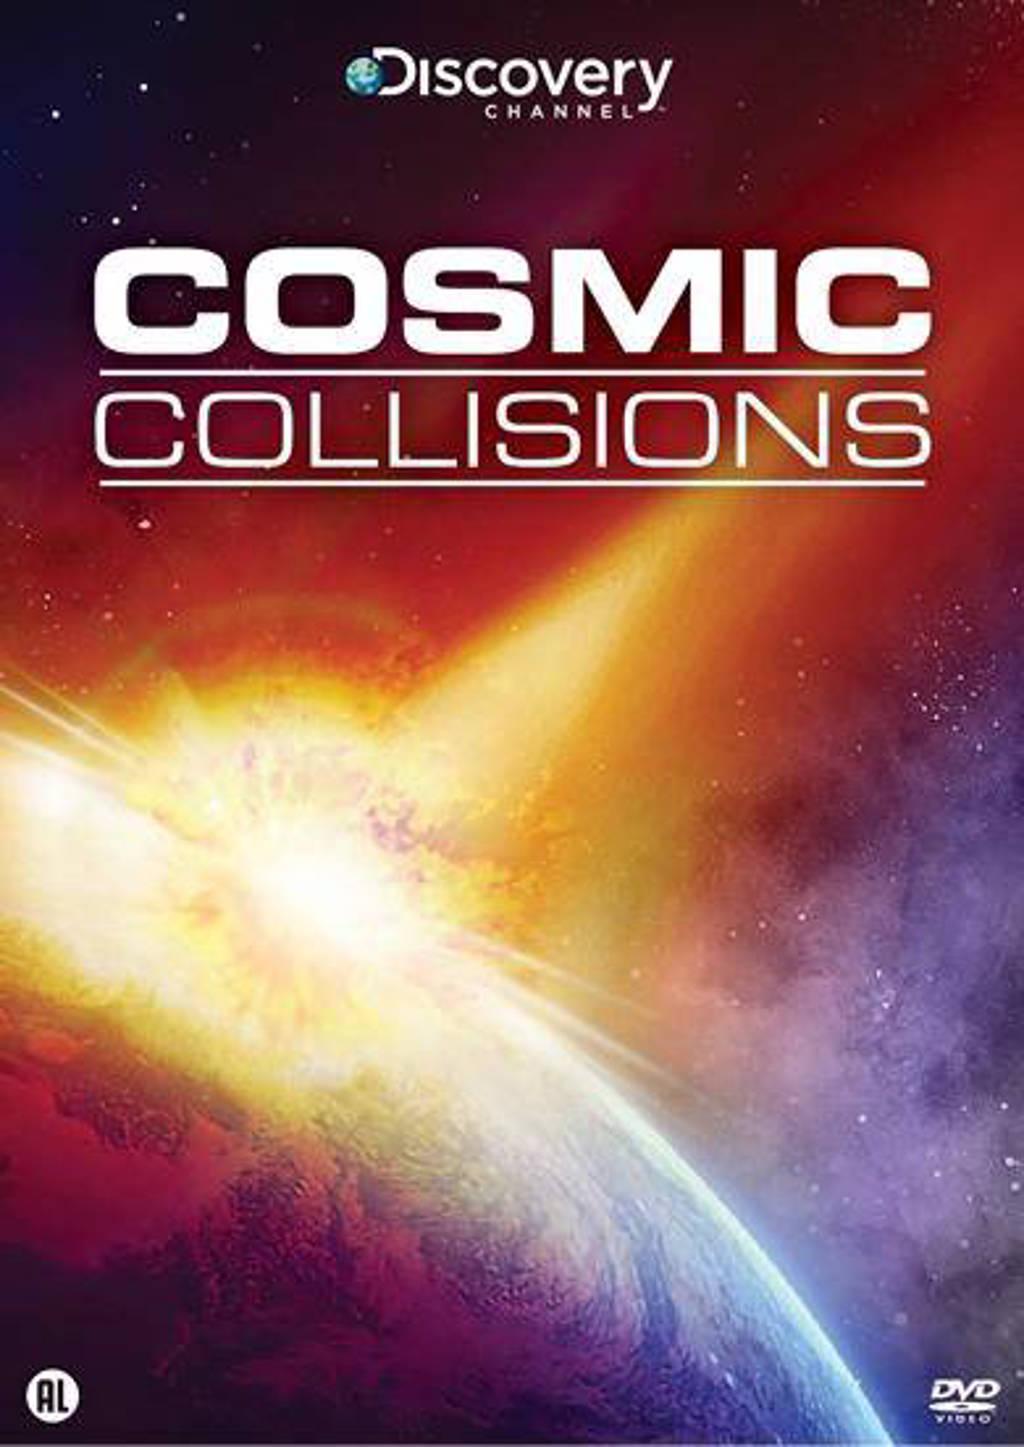 Cosmic collisions (DVD)